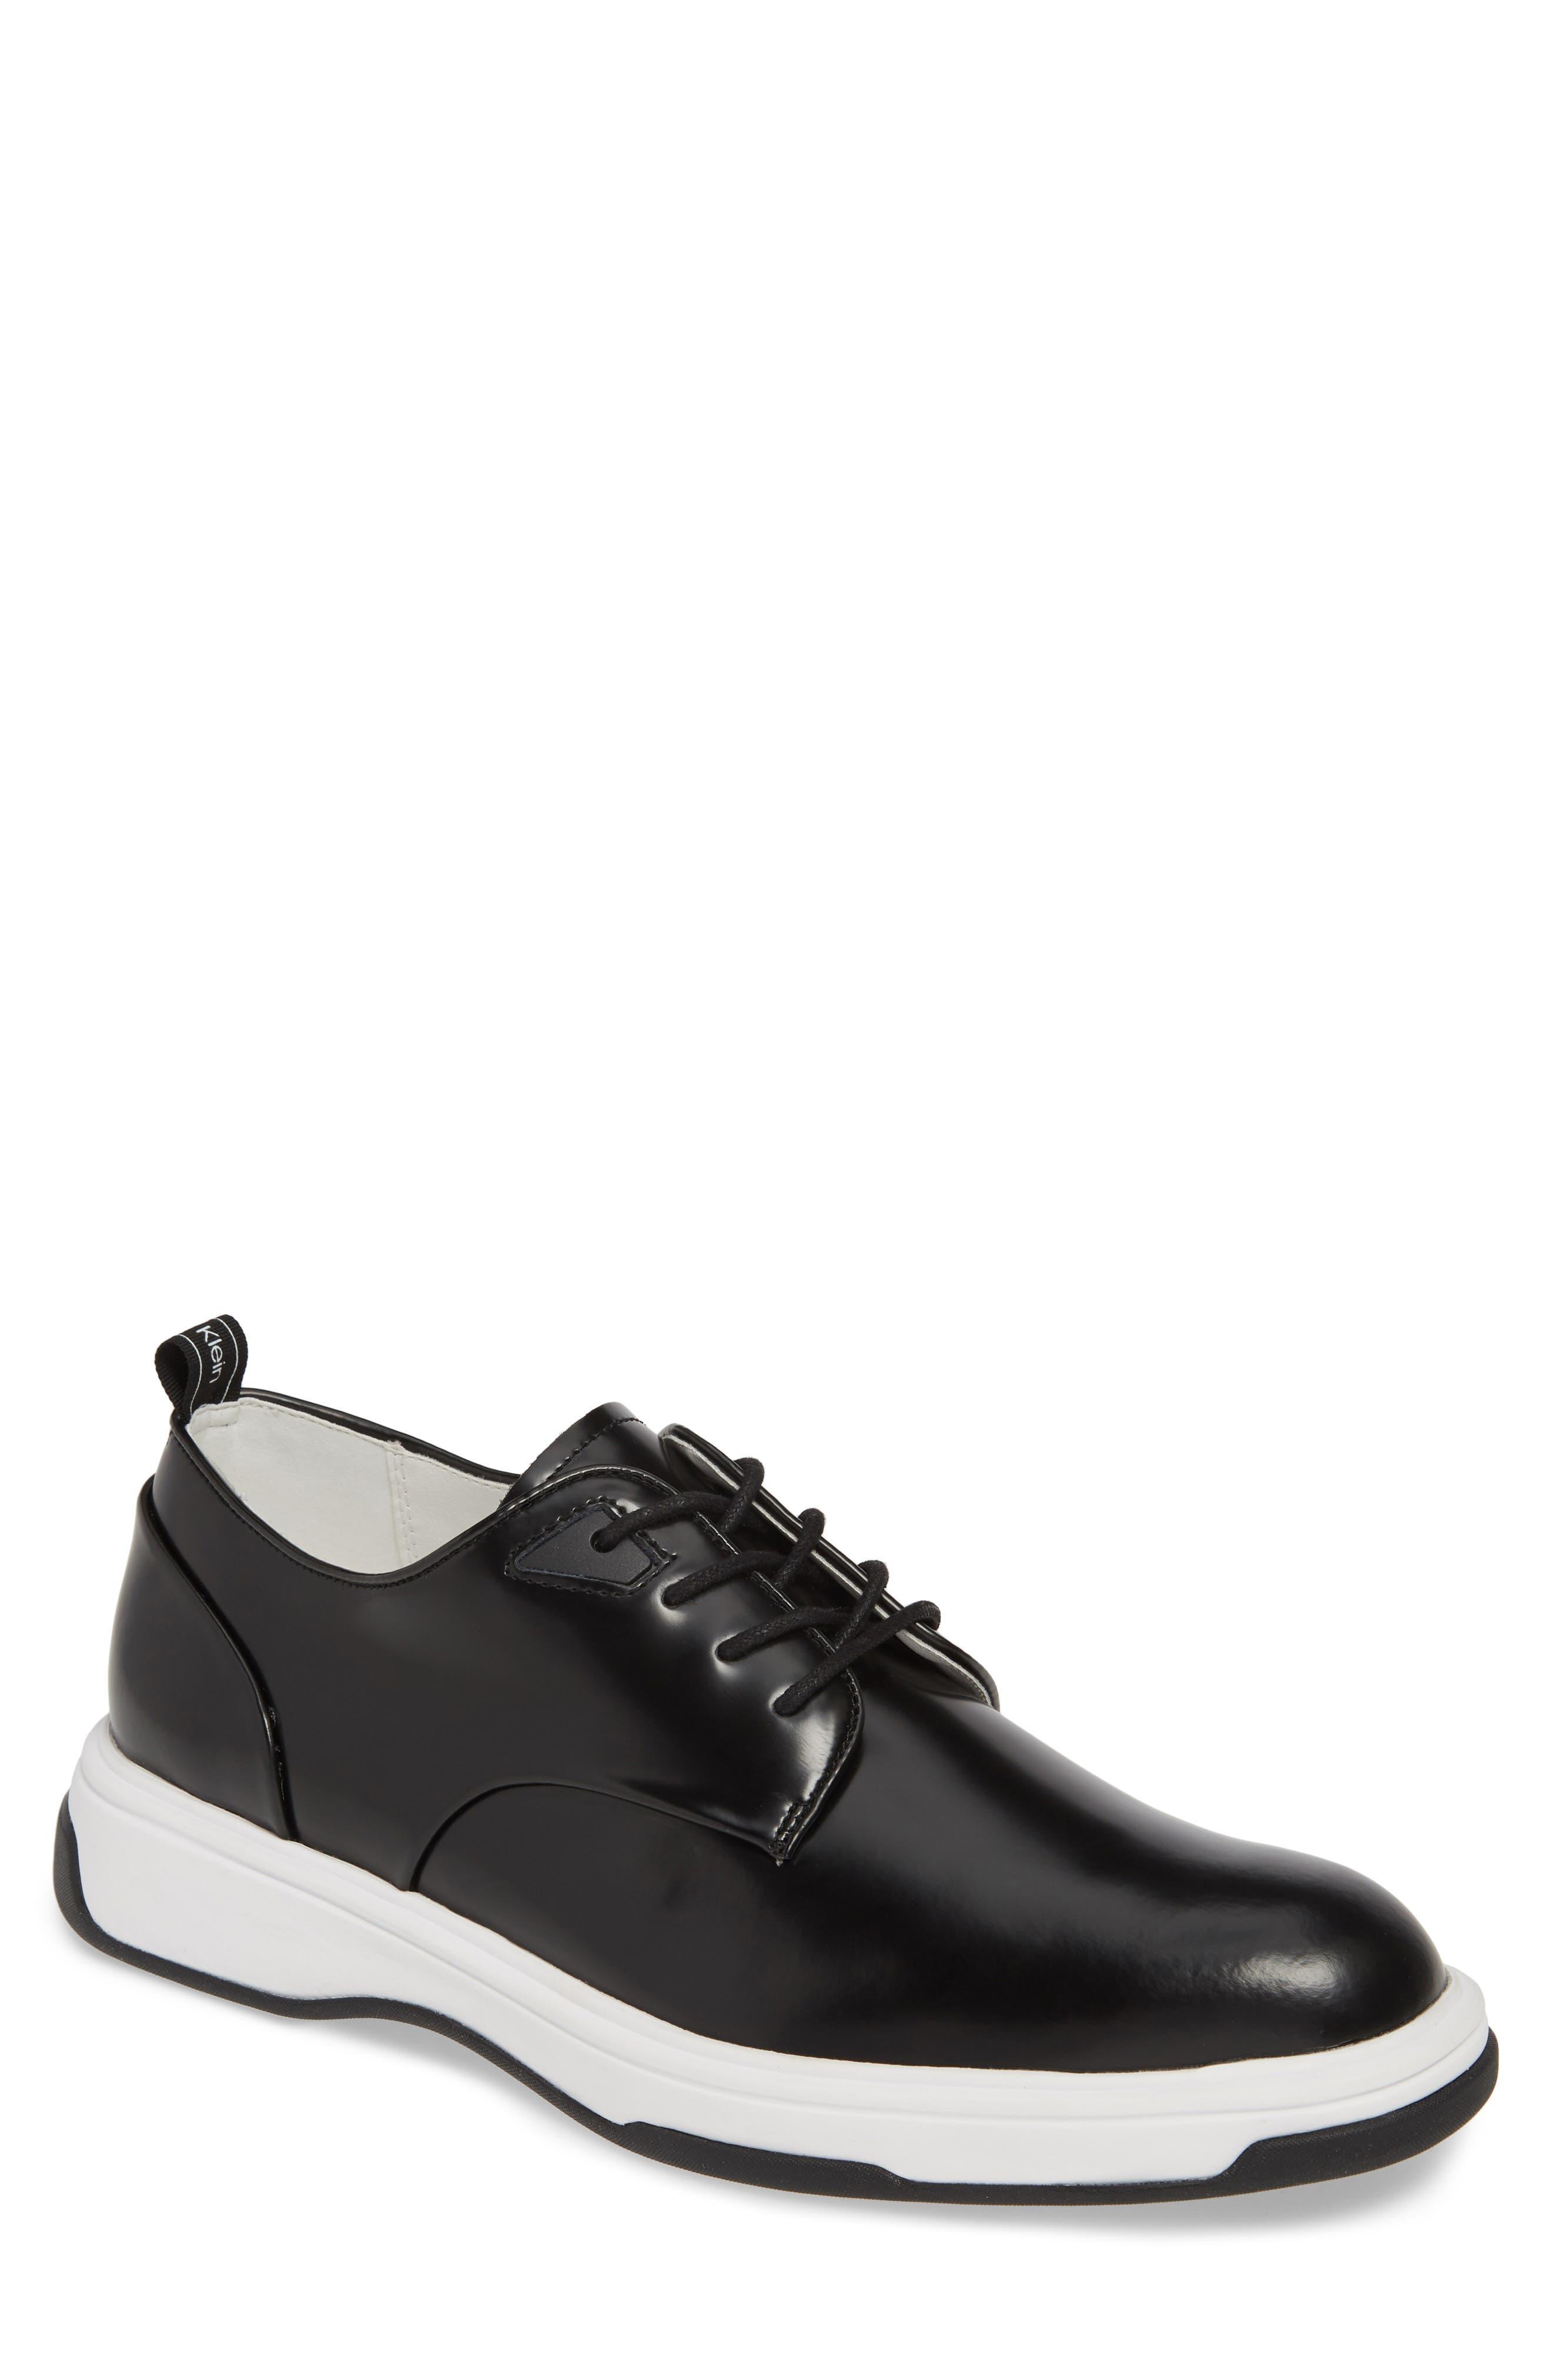 CALVIN KLEIN, Patsy Sneaker, Main thumbnail 1, color, BLACK